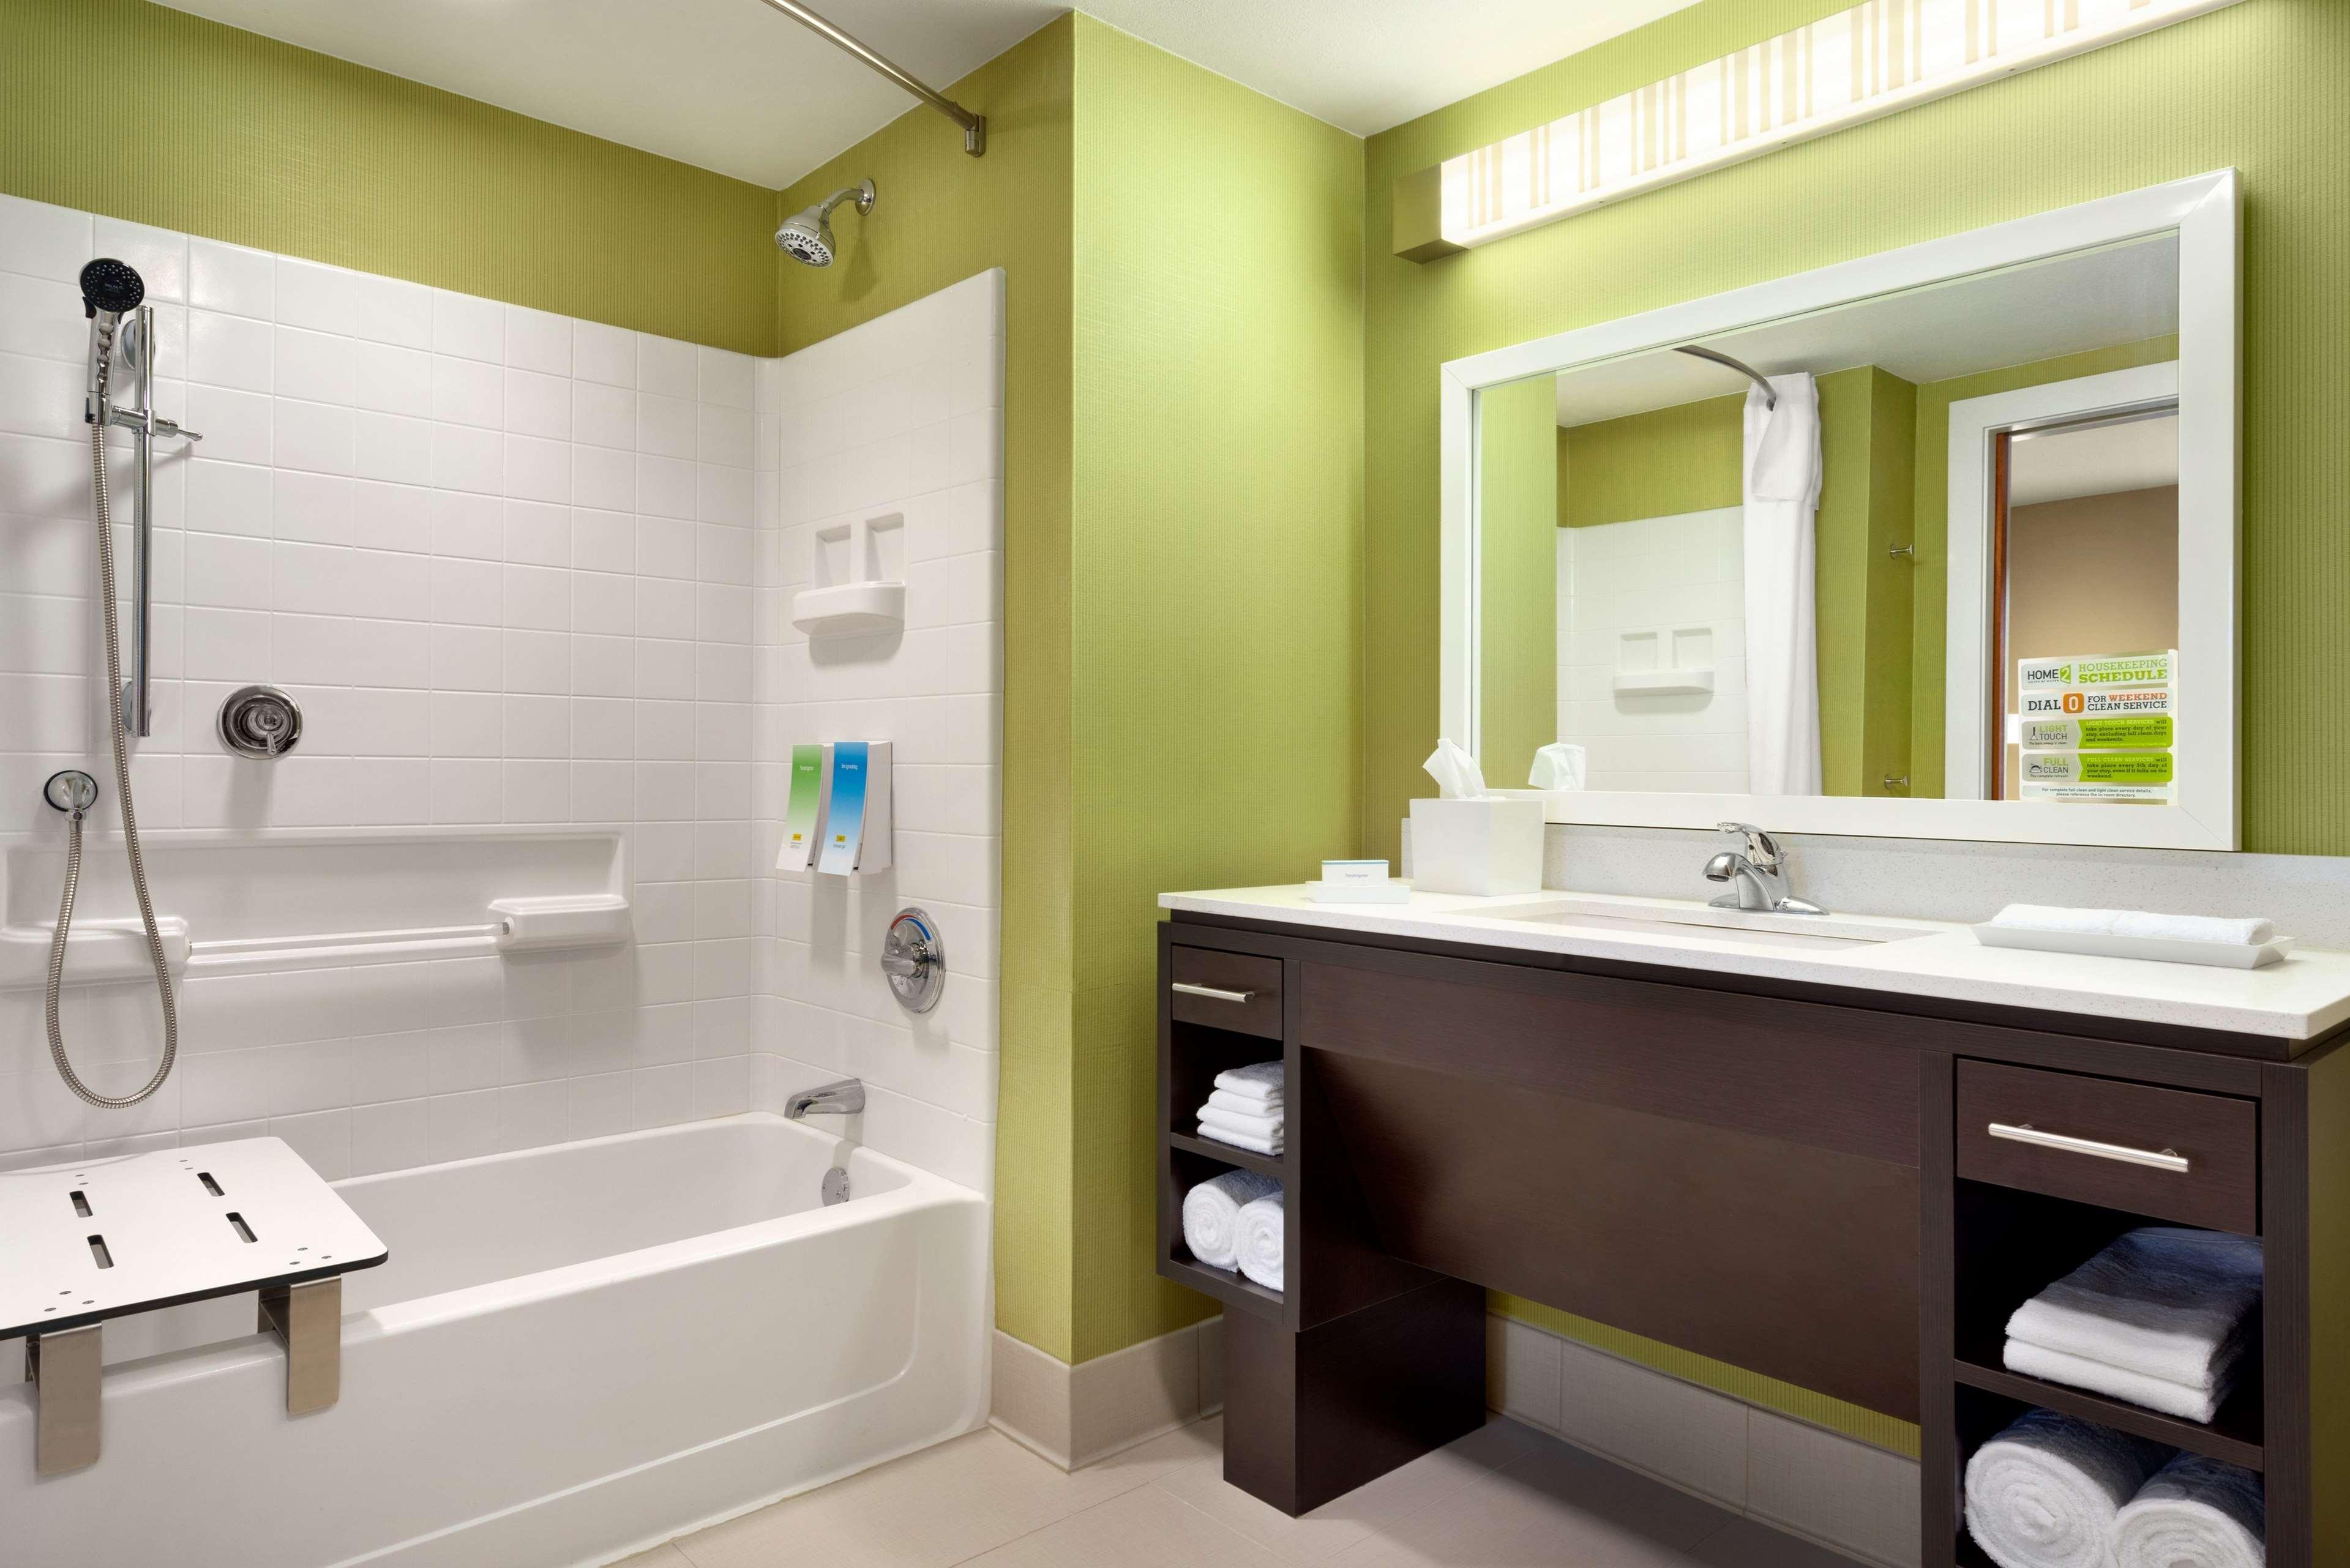 Home2 Suites by Hilton Leavenworth Downtown image 21